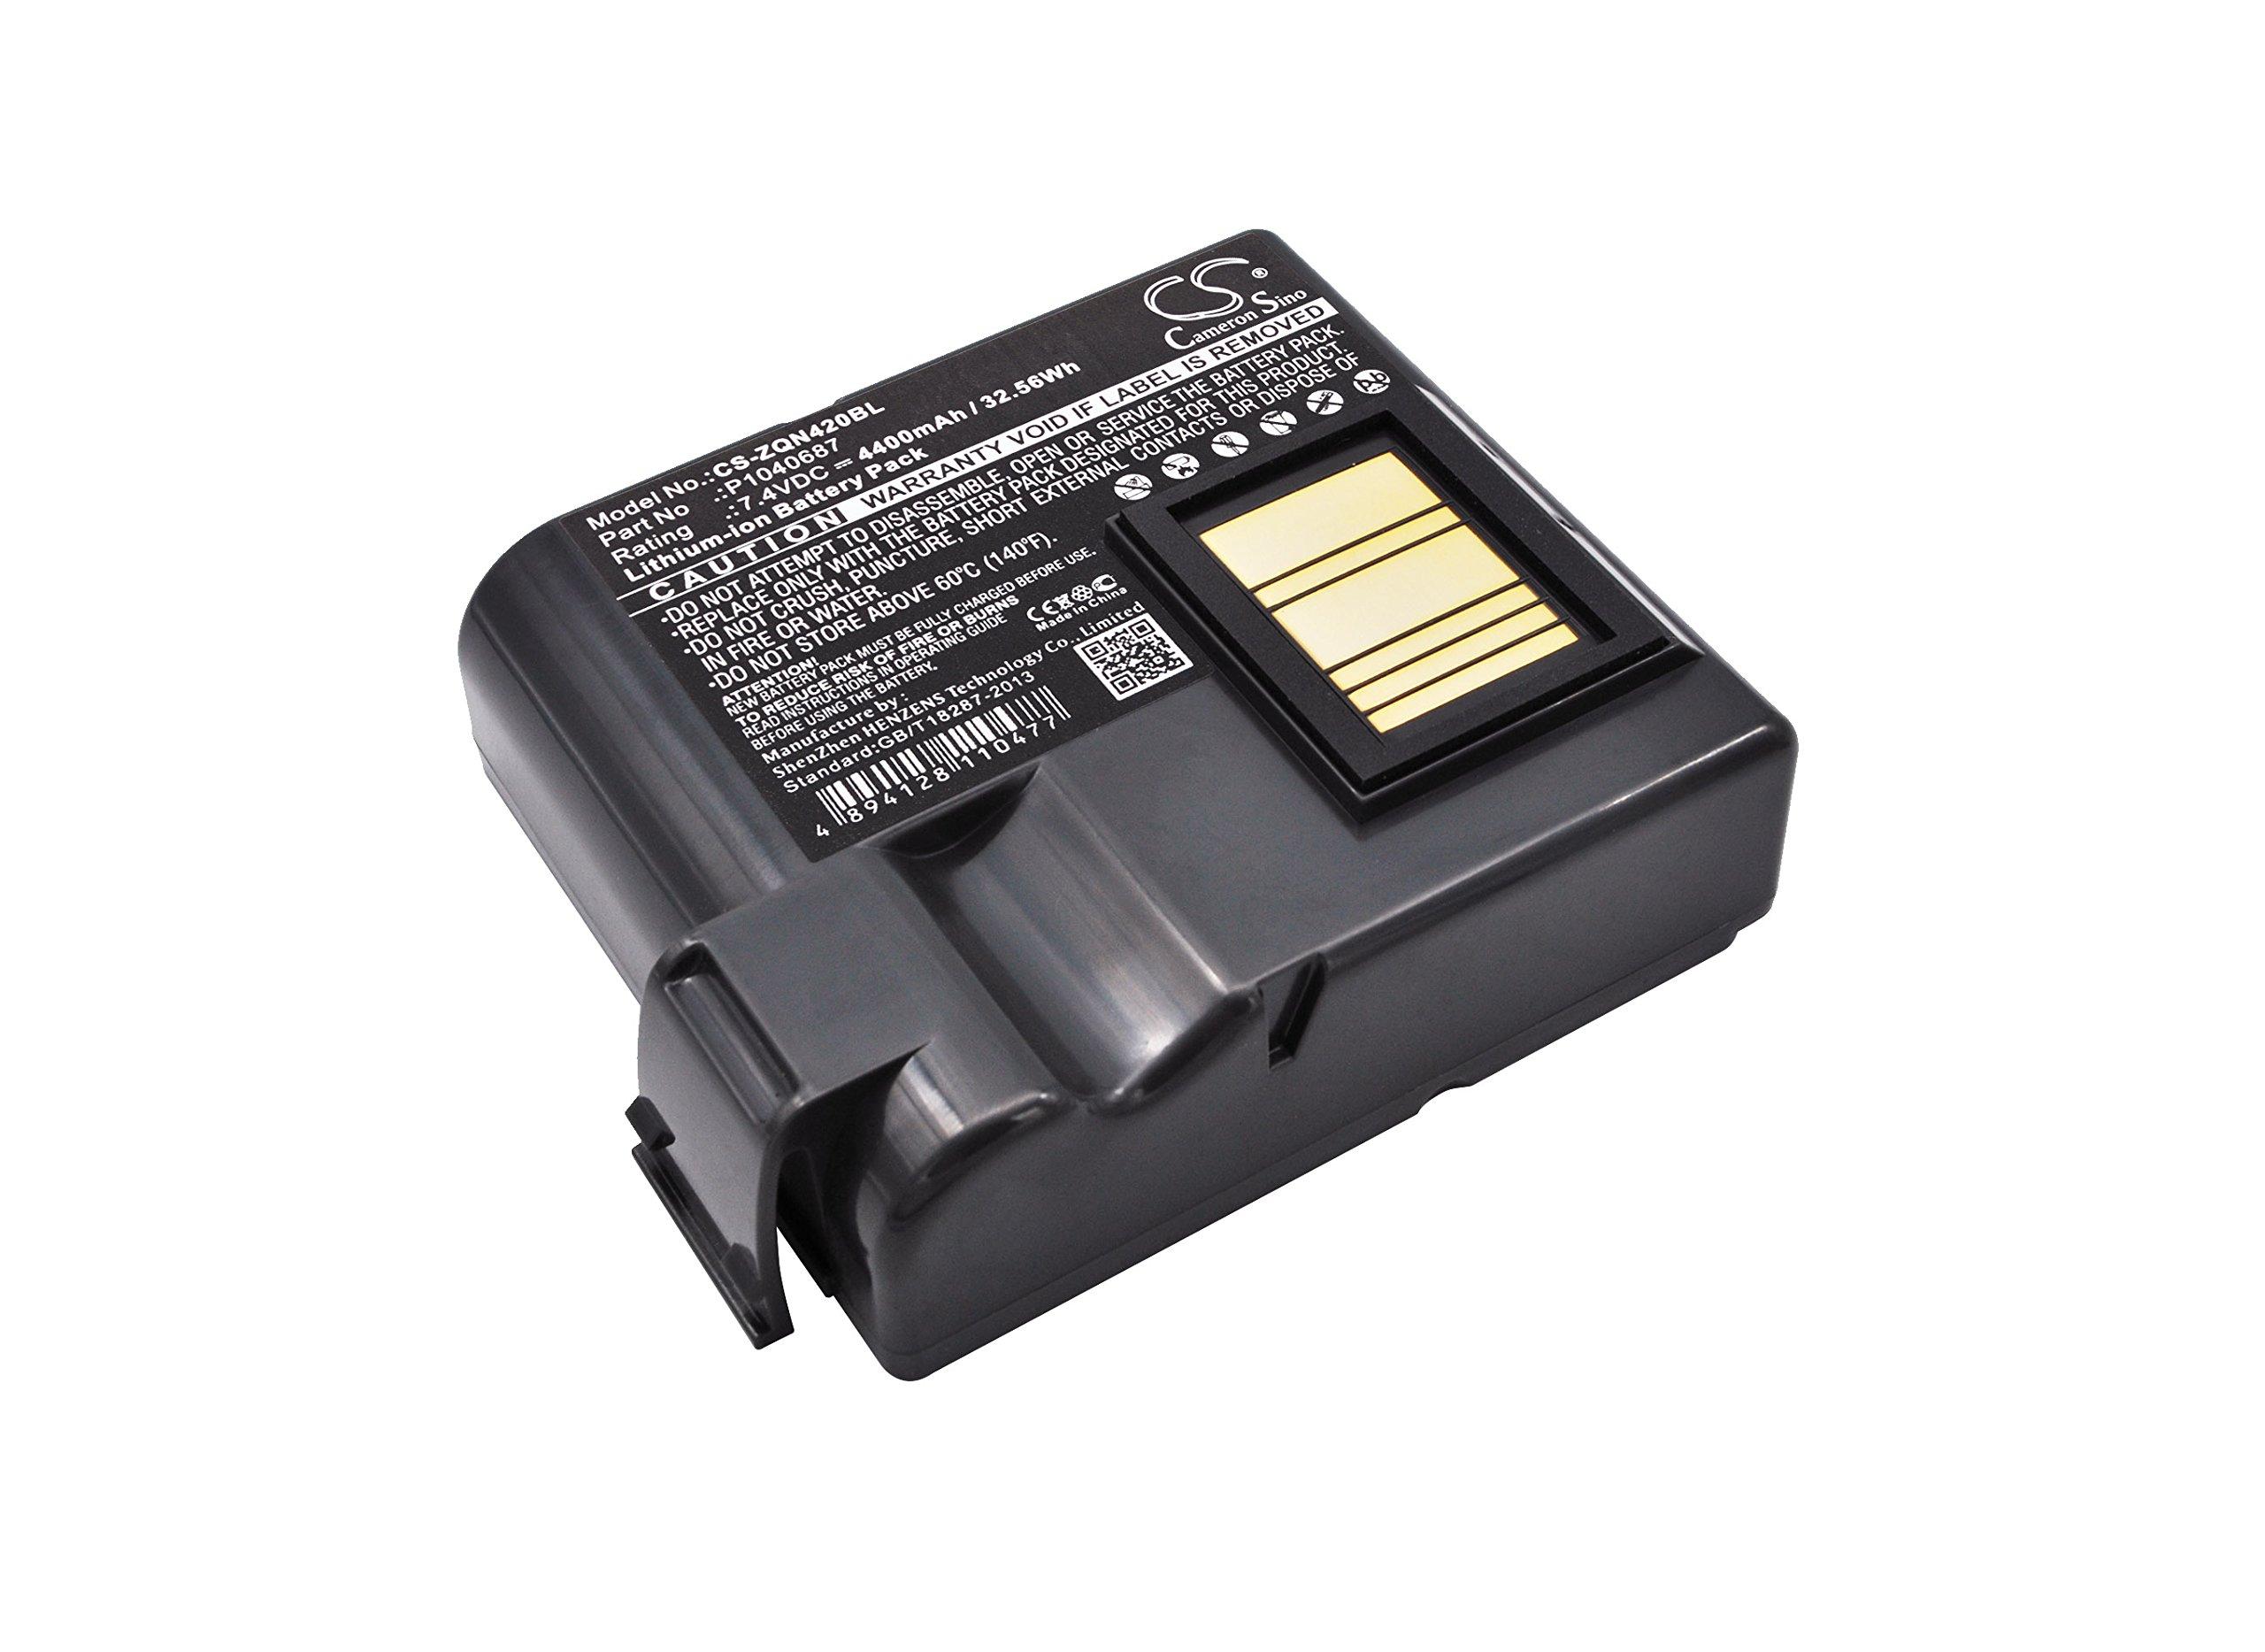 Cameron Sino 4400mAh Battery for Zebra QLN420